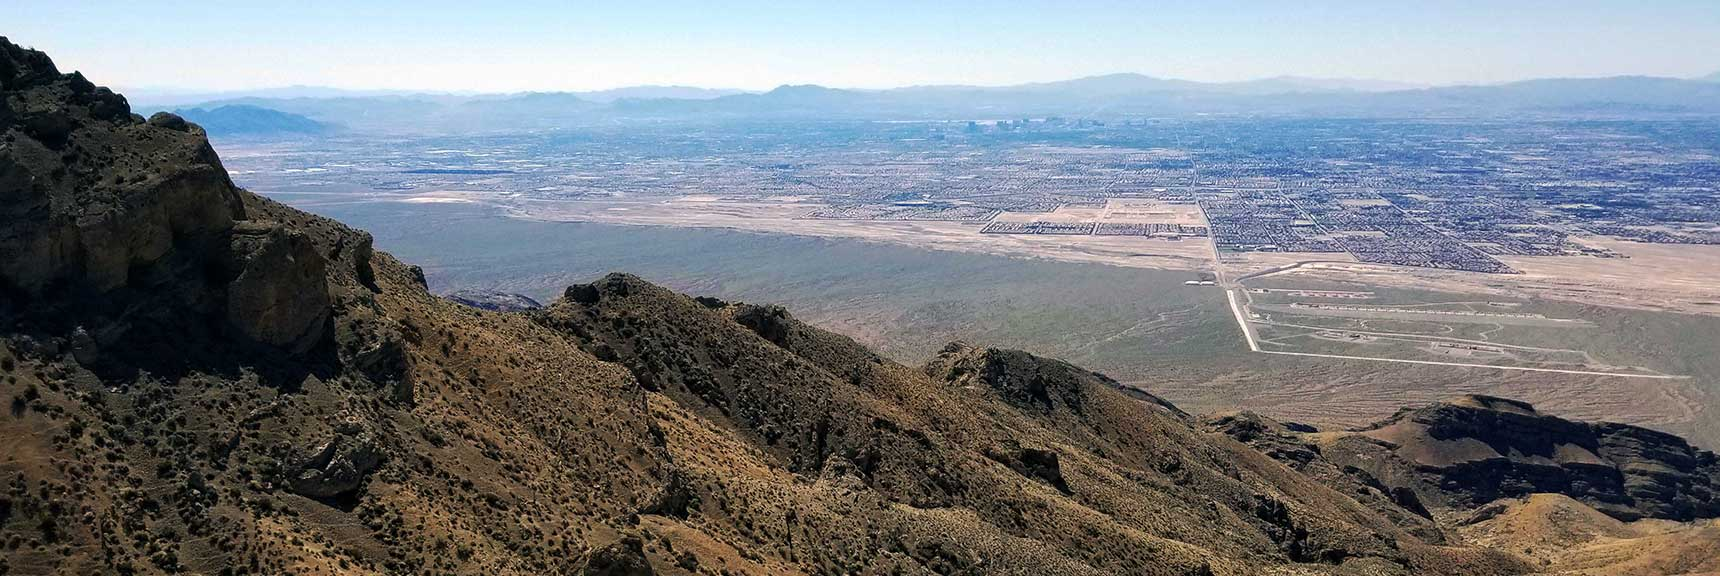 View of Las Vegas from Gass Peak Mid Summit North of Las Vegas, Nevada